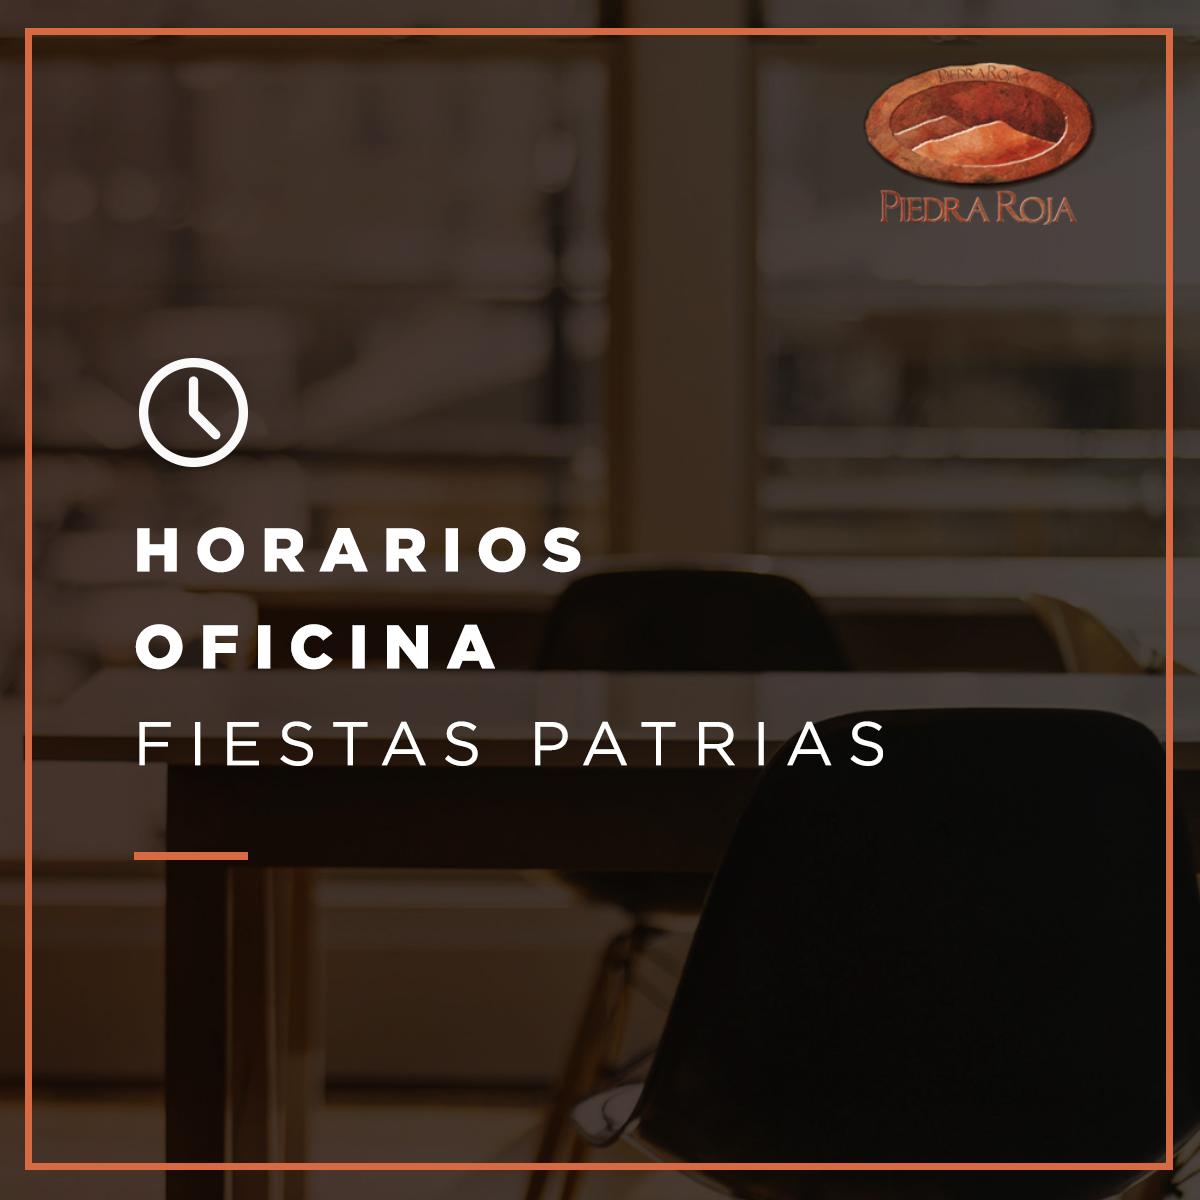 POST-WEB_PR_FIESTAS-PATRIAS_HORARIOSOFICINA